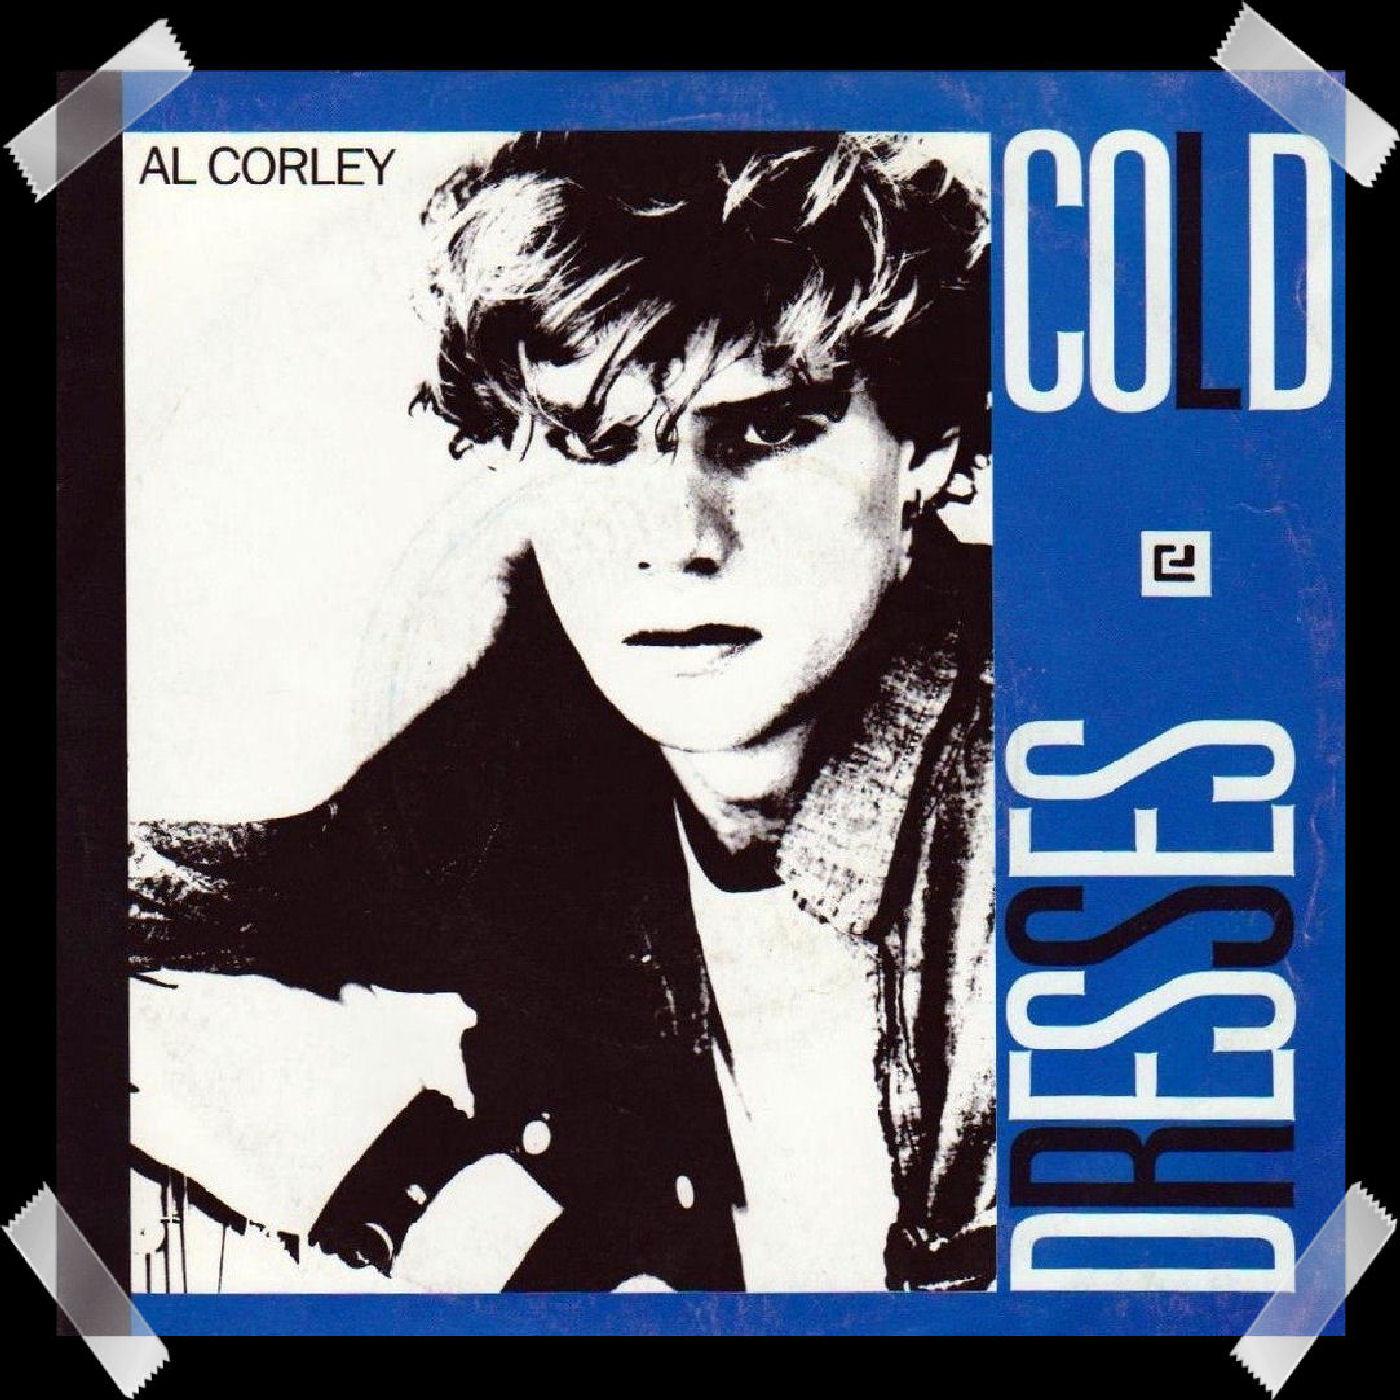 07. Al Corley - Cold Dresses